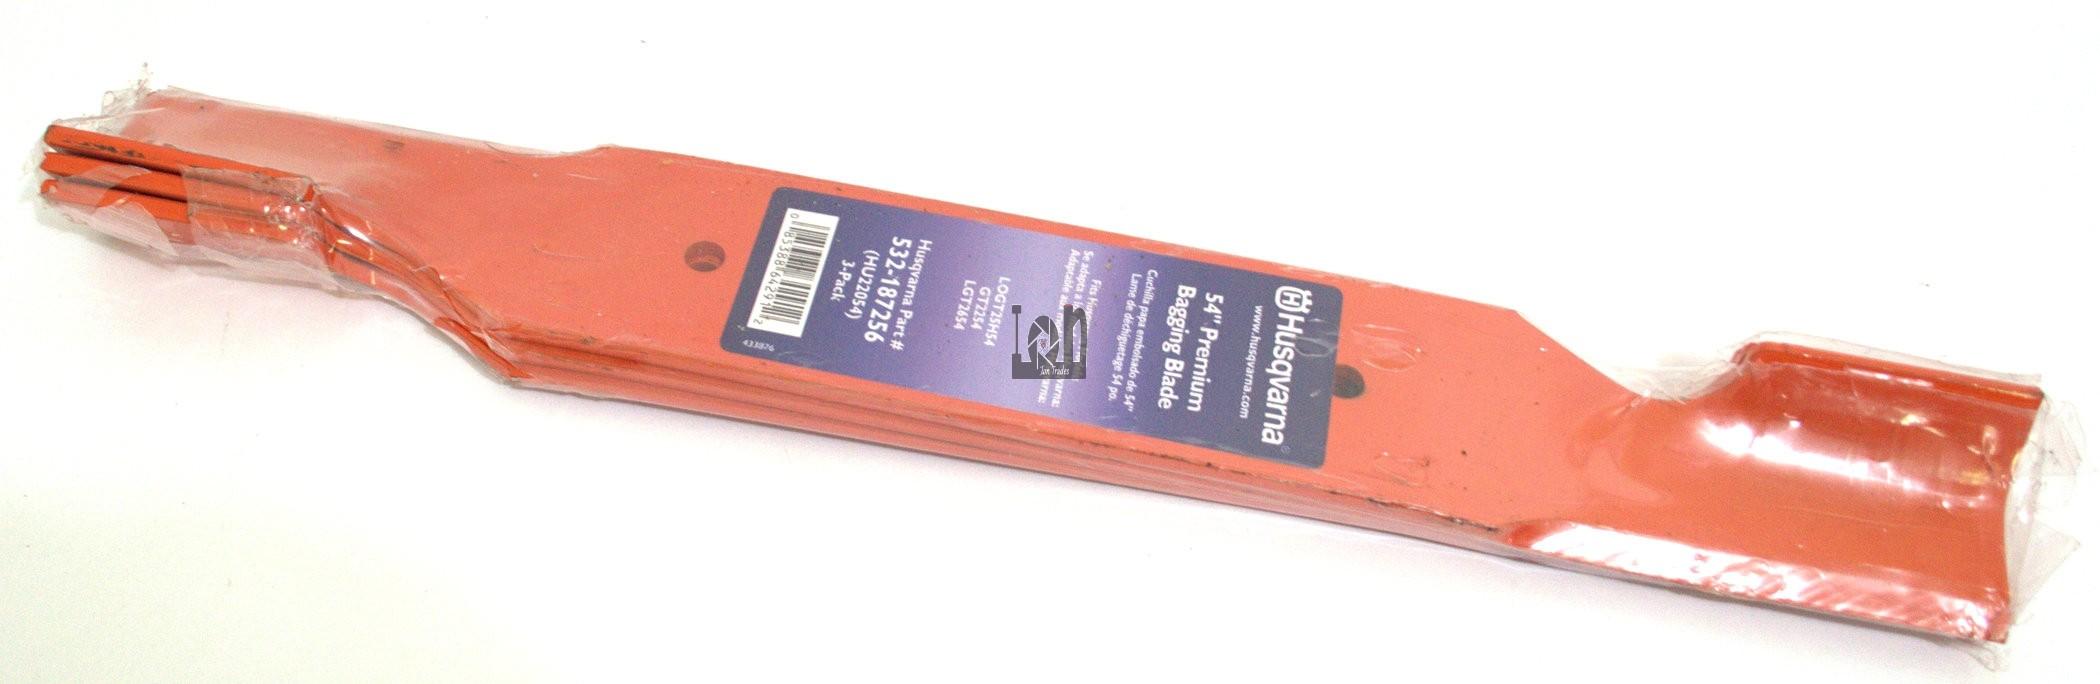 Husqvarna HU22054 54-Inch Premium Hi-Lift Bagging Blade 532-187256